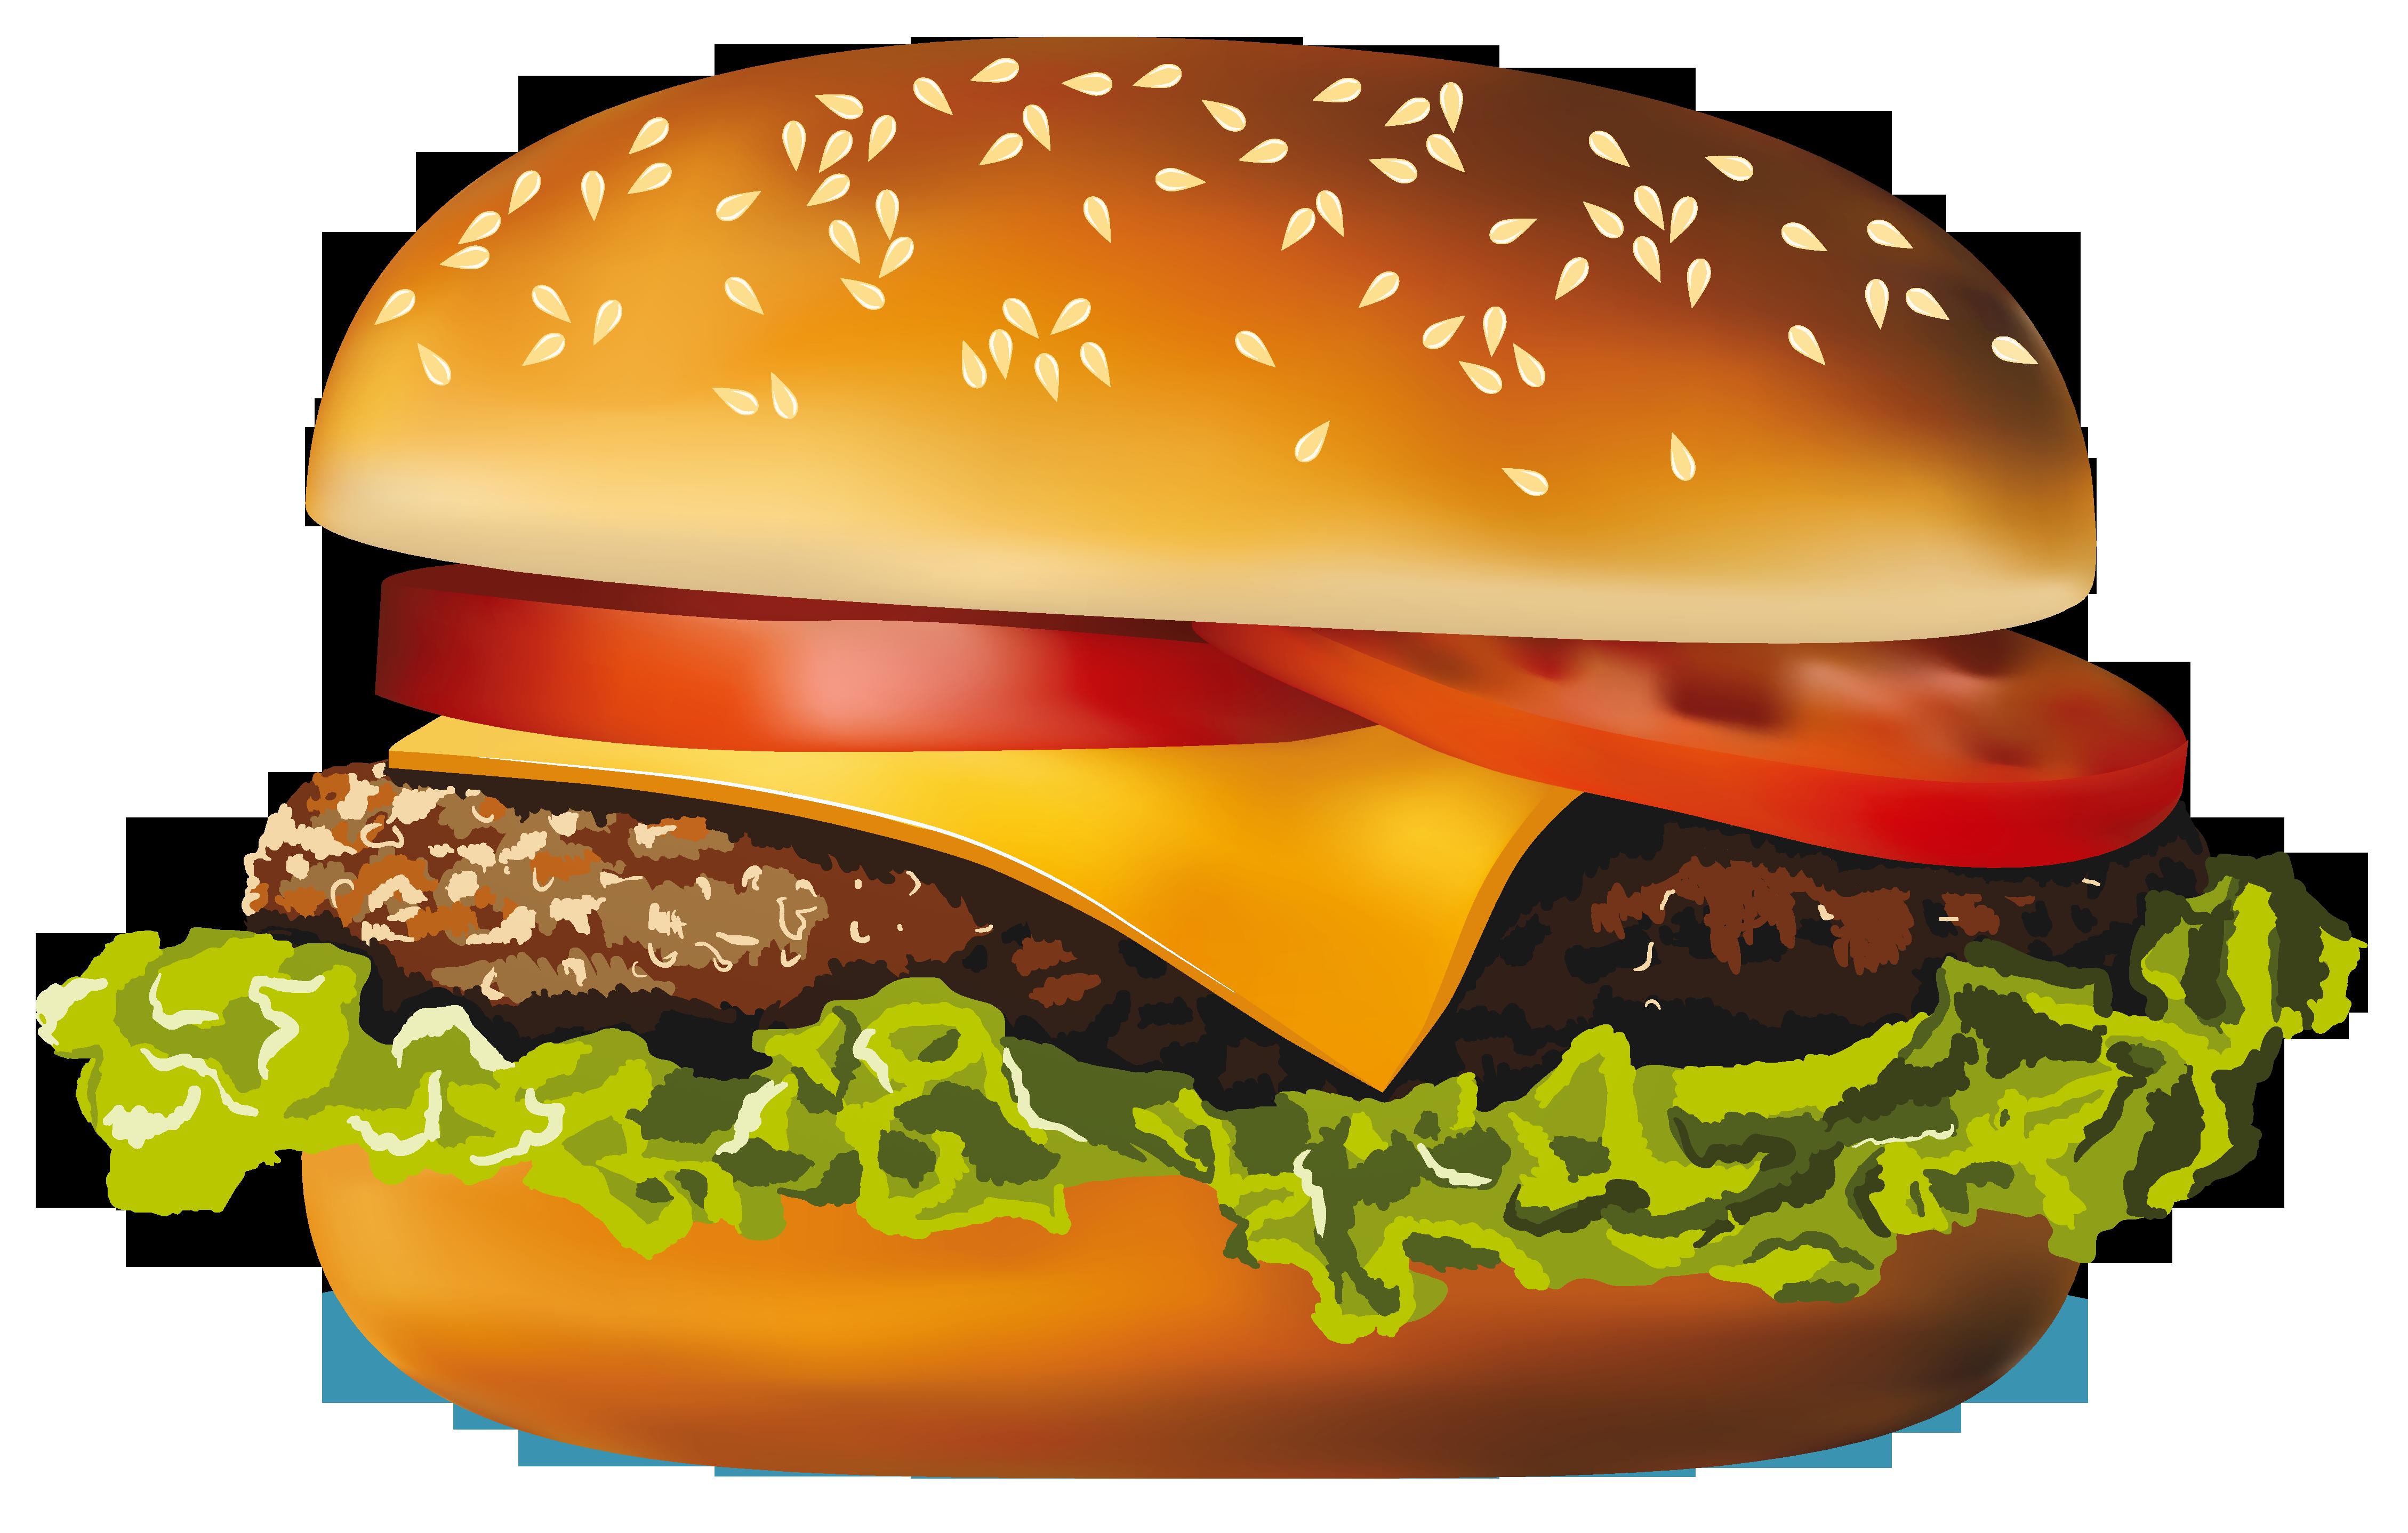 Hot dog fast food. Hamburger clipart pizza